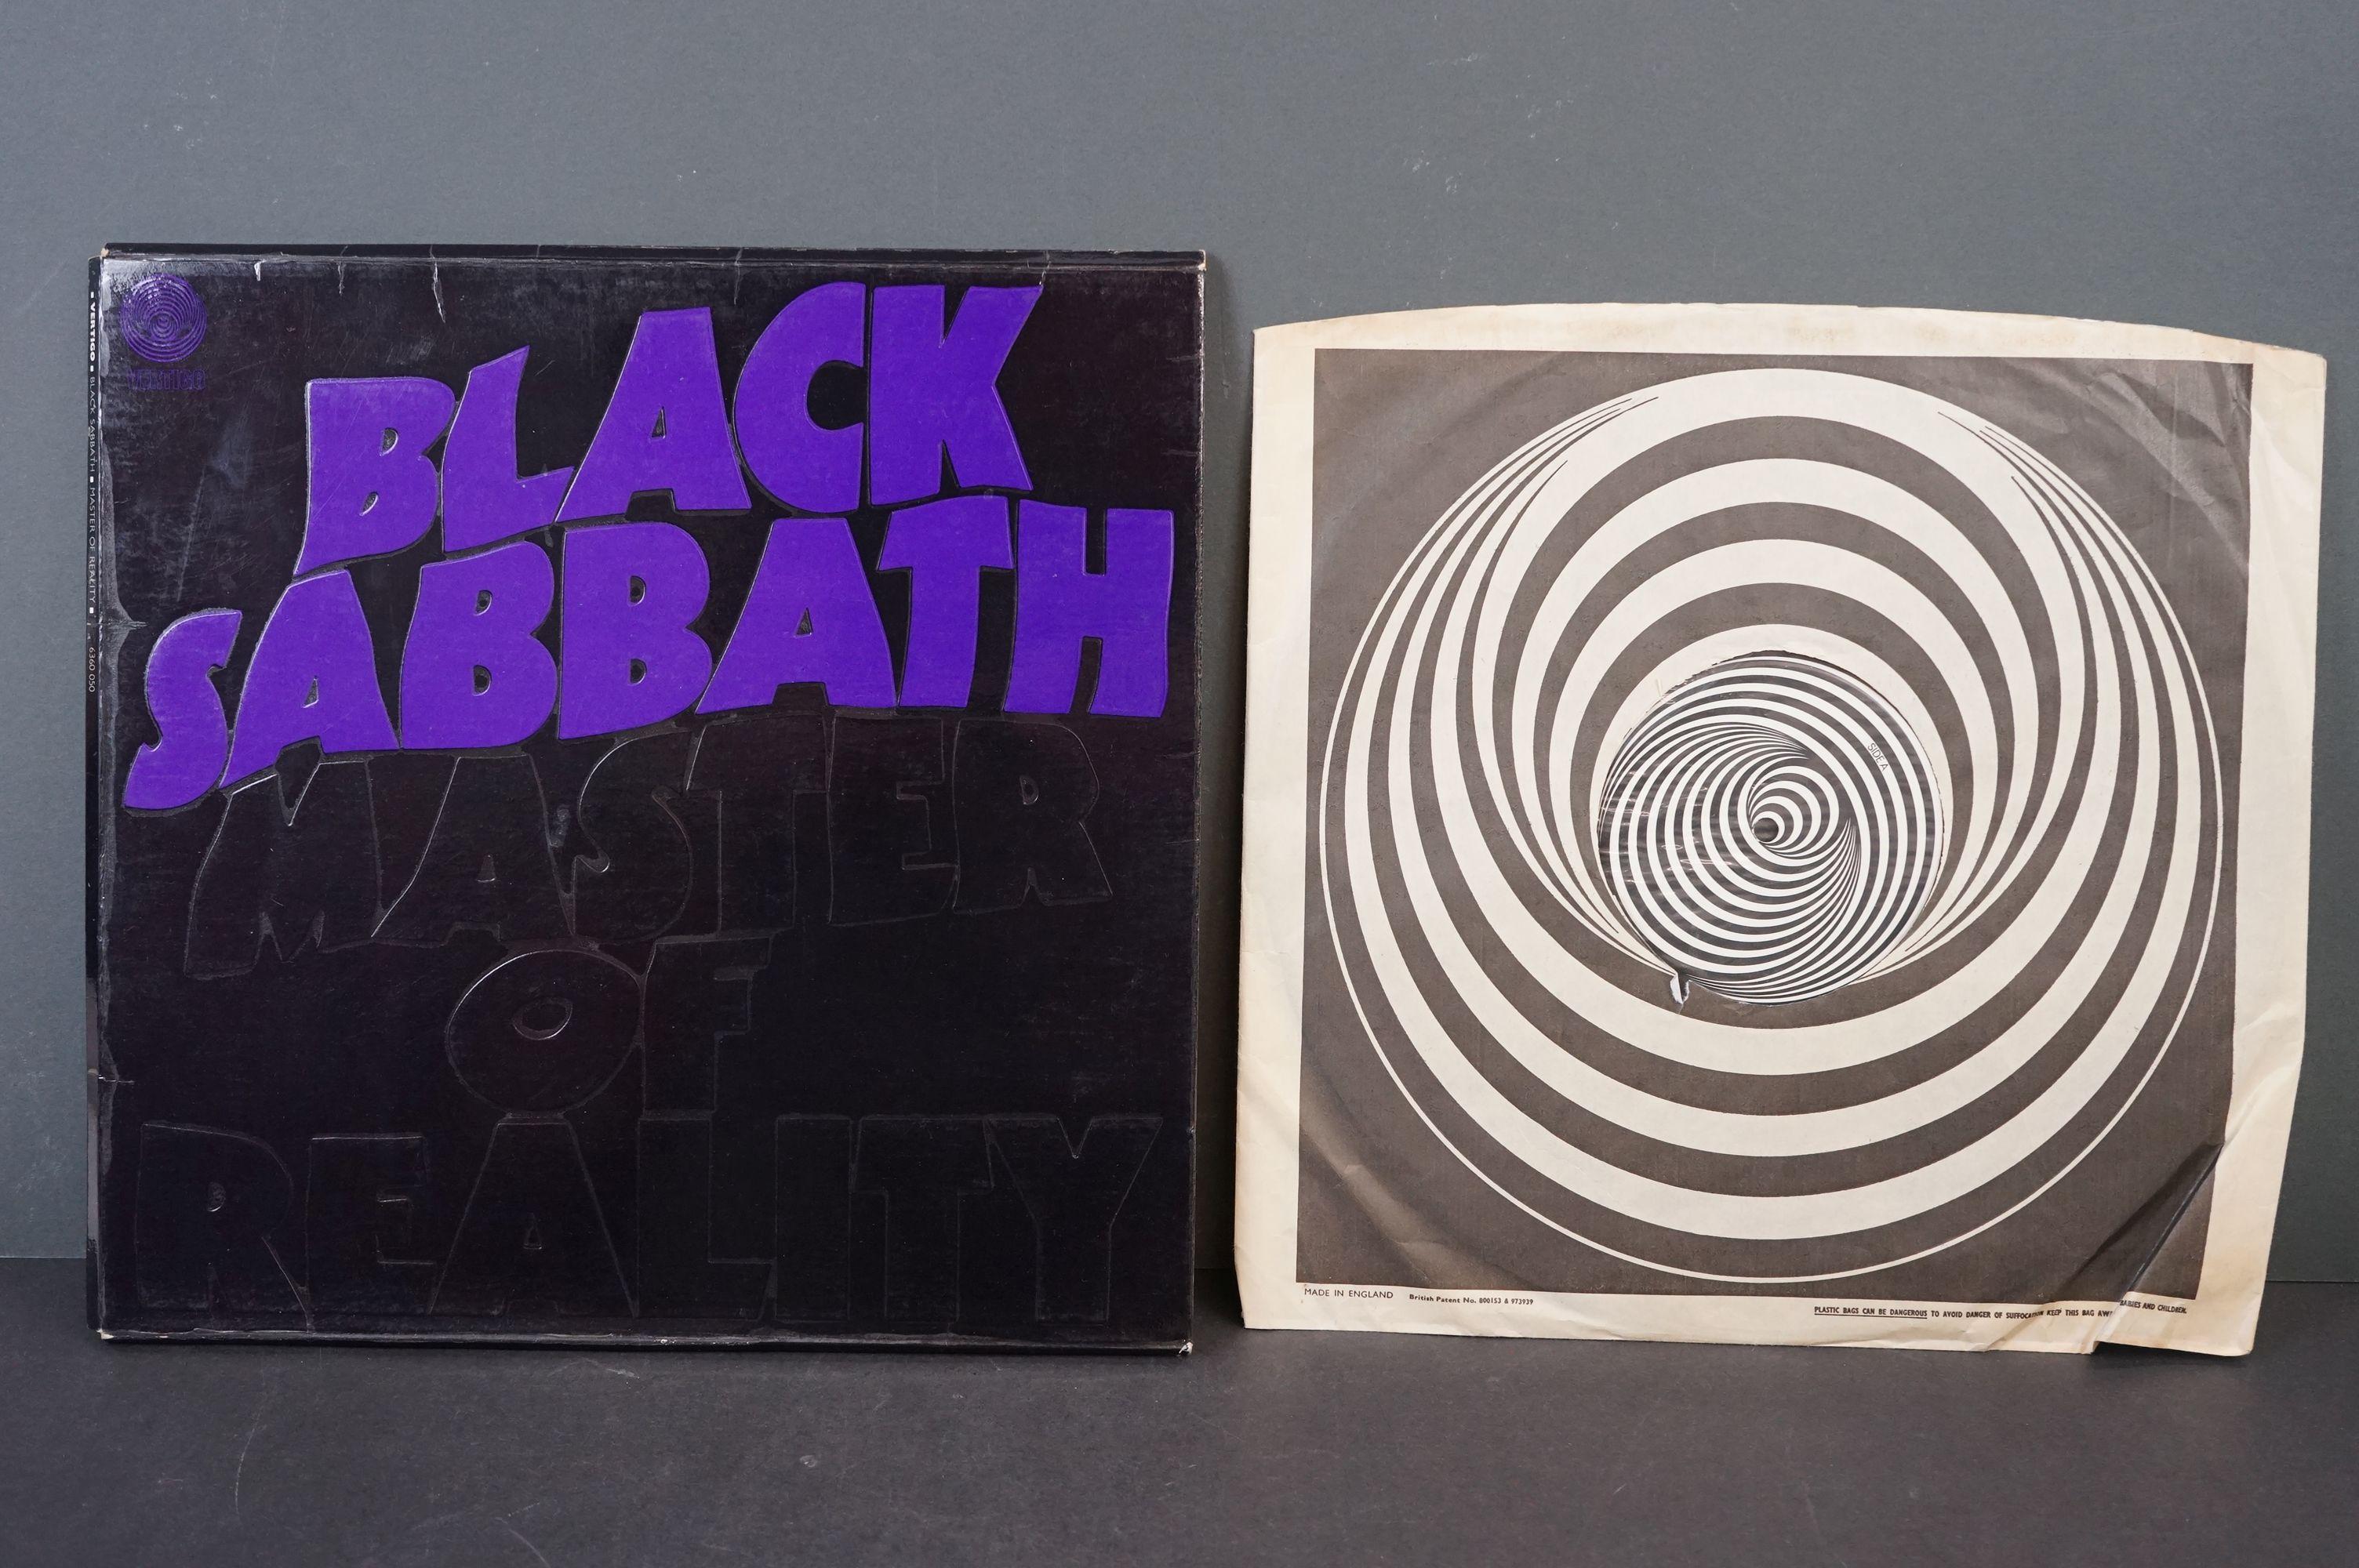 Vinyl - Black Sabbath - Master Of Reality. Original UK 1971 1st Black label, Swirl Vertigo label - Image 2 of 5